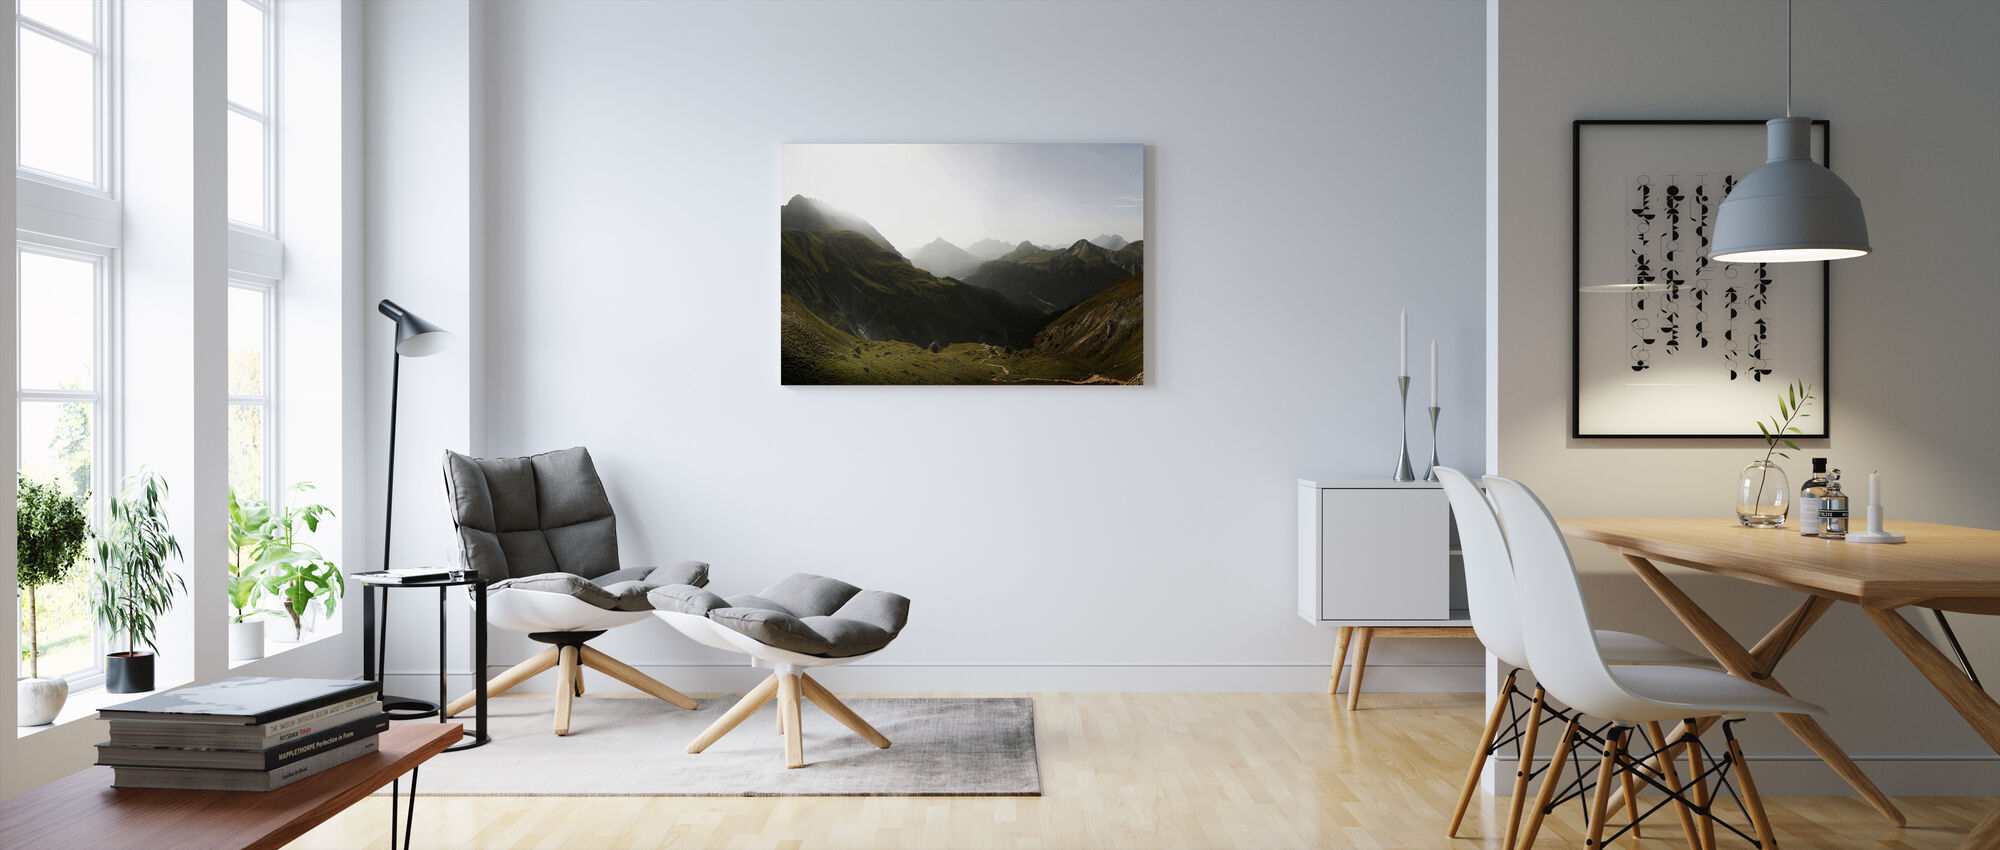 Zwitserland Scenics - Canvas print - Woonkamer